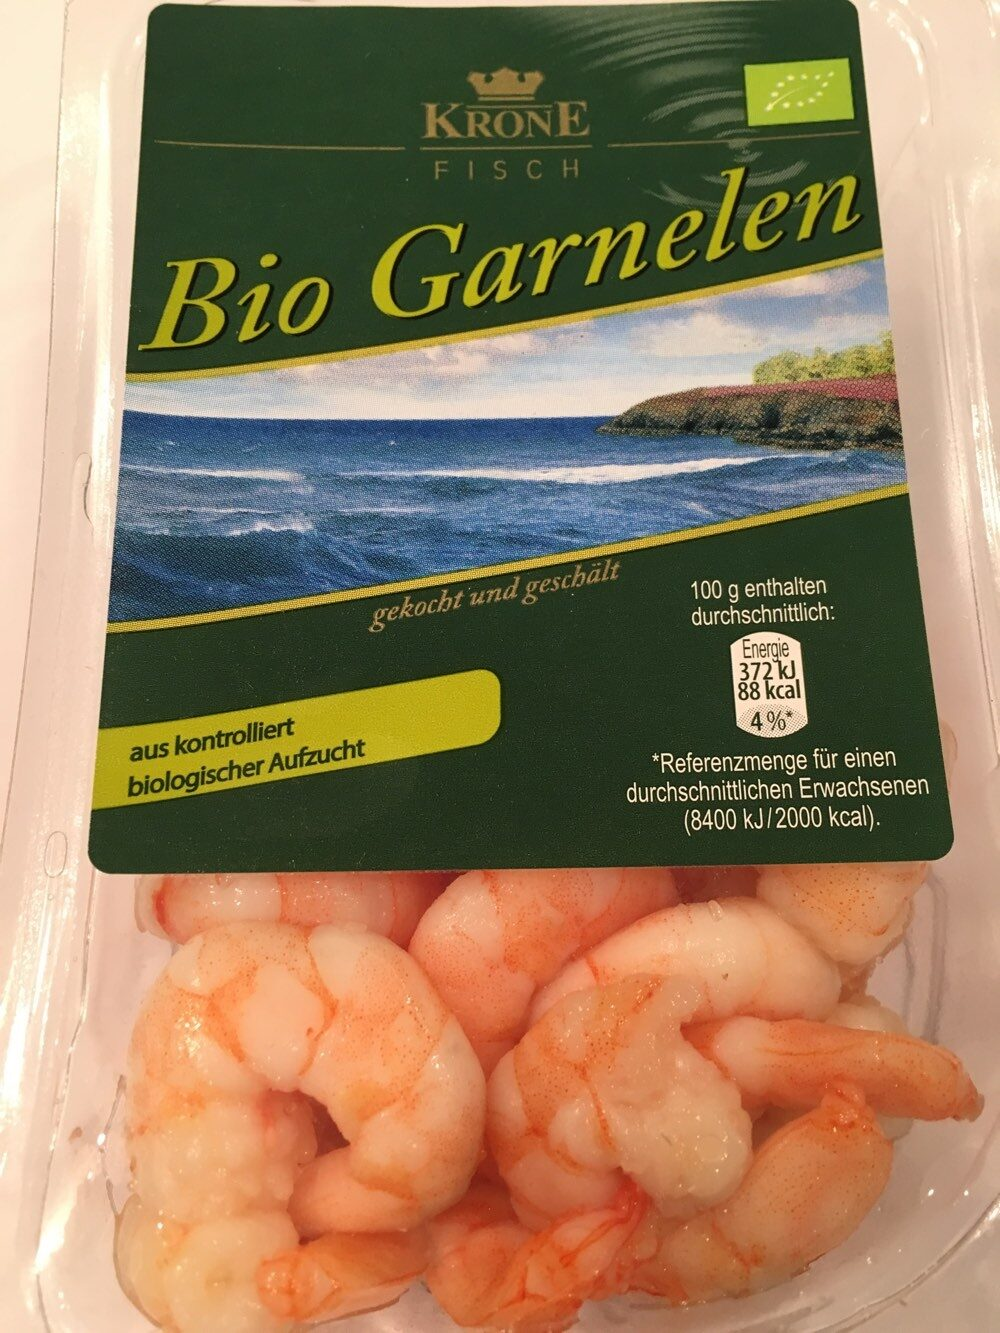 Bio Garnelen - Product - de